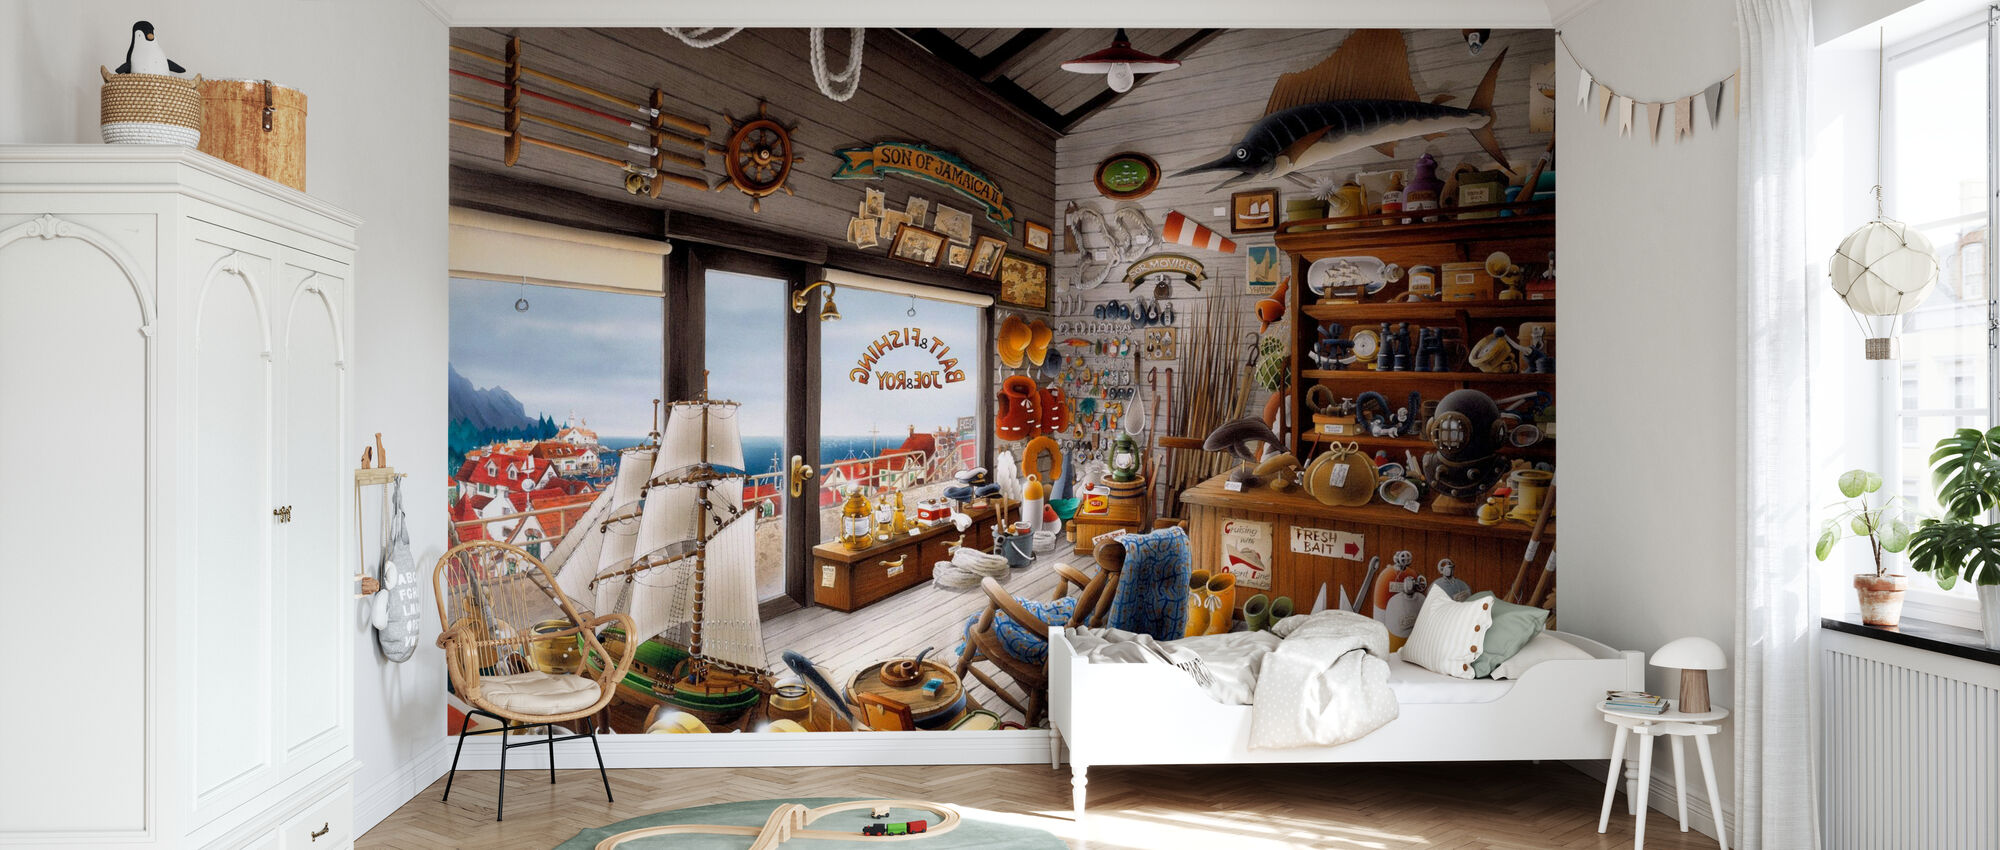 Fishing Shop - Wallpaper - Kids Room